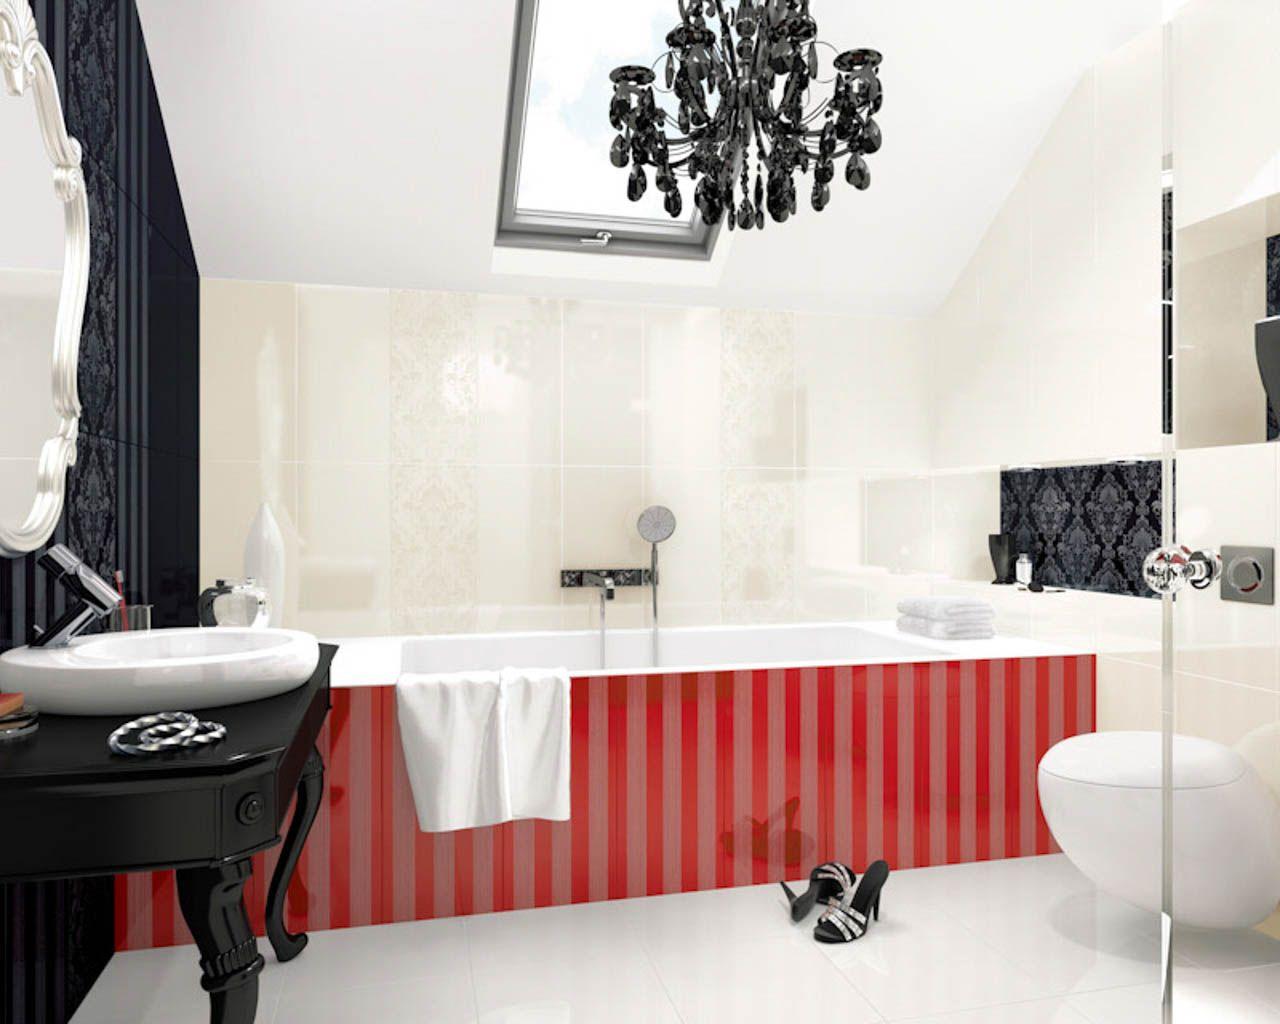 Bellicita / Purio bathroom tiles- white, black and red bathroom ...